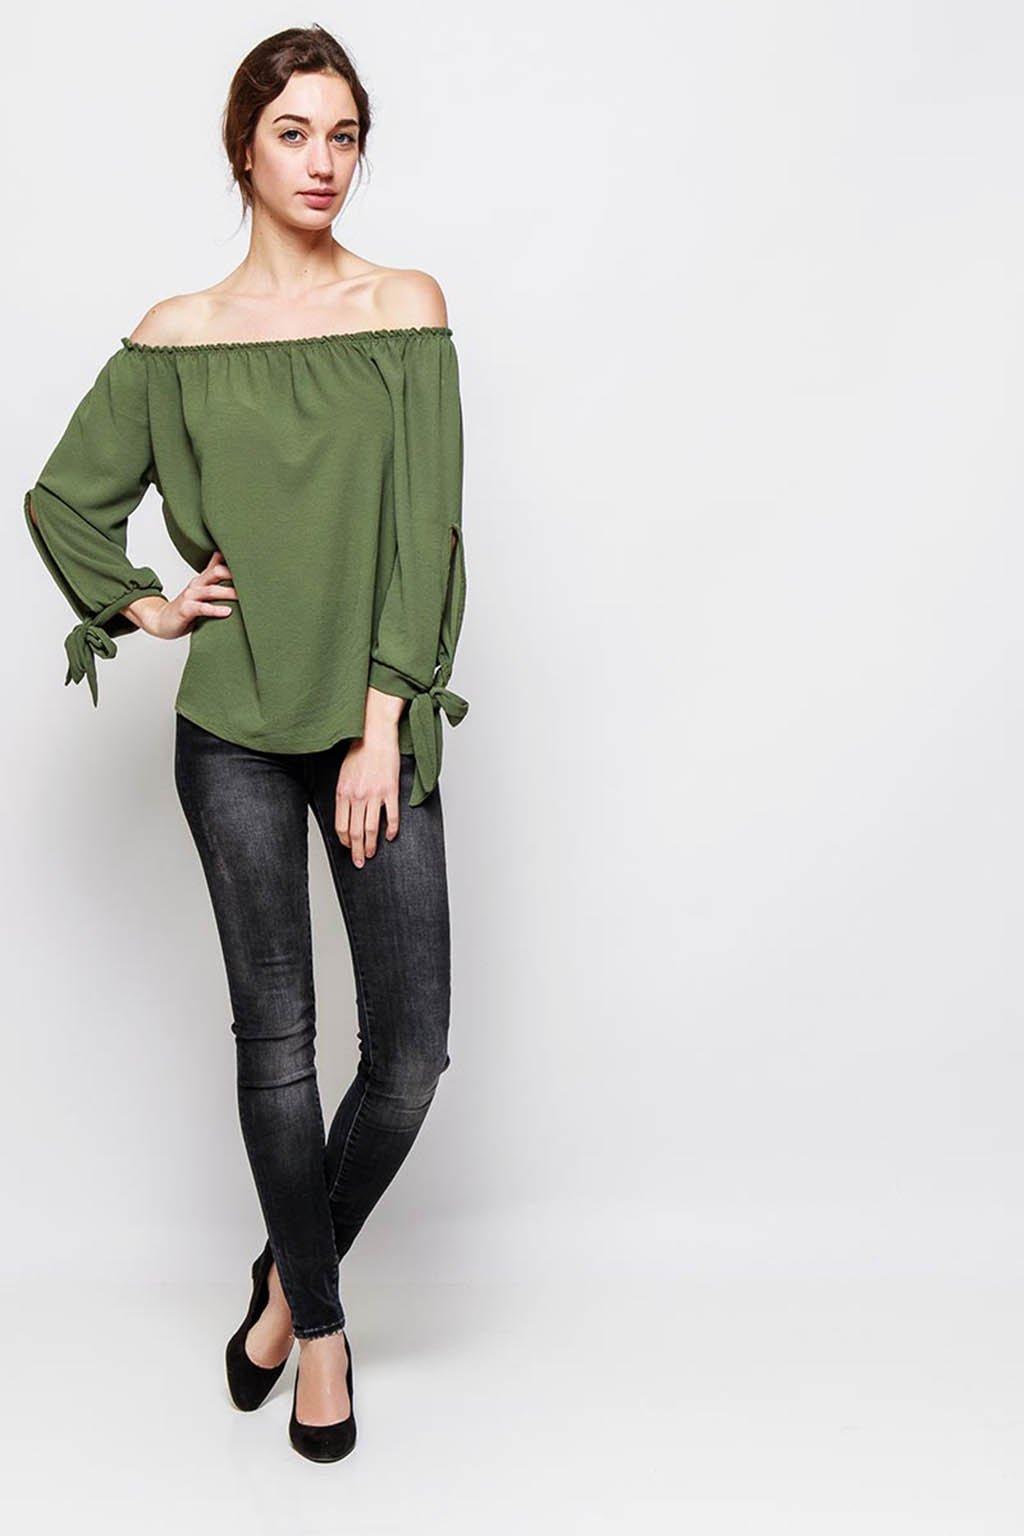 Khaki dámská halenka s odhalenými rameny